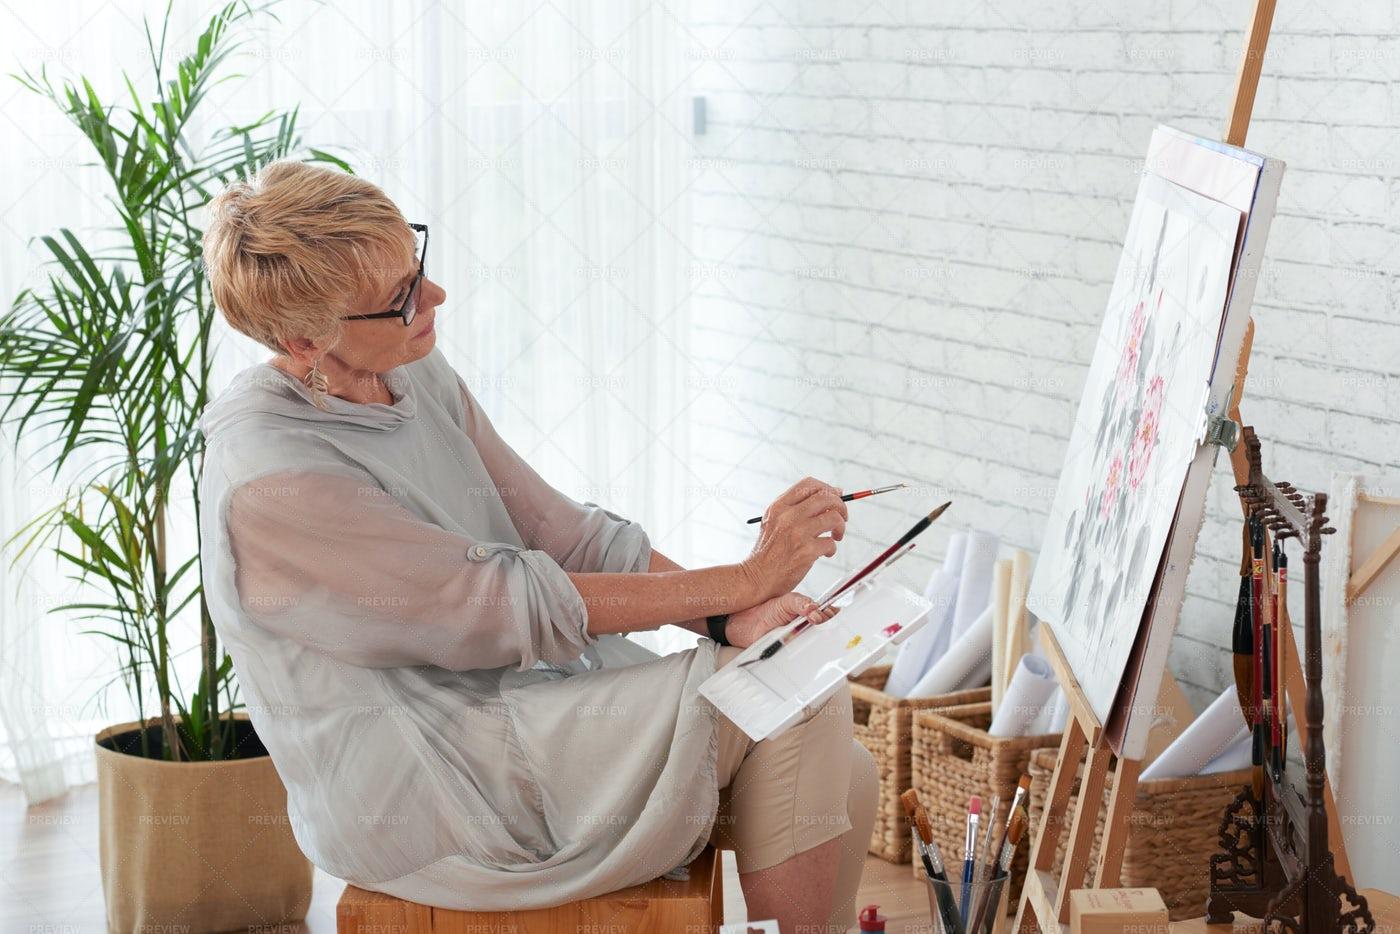 Mature Woman Painting In Art Studio: Stock Photos